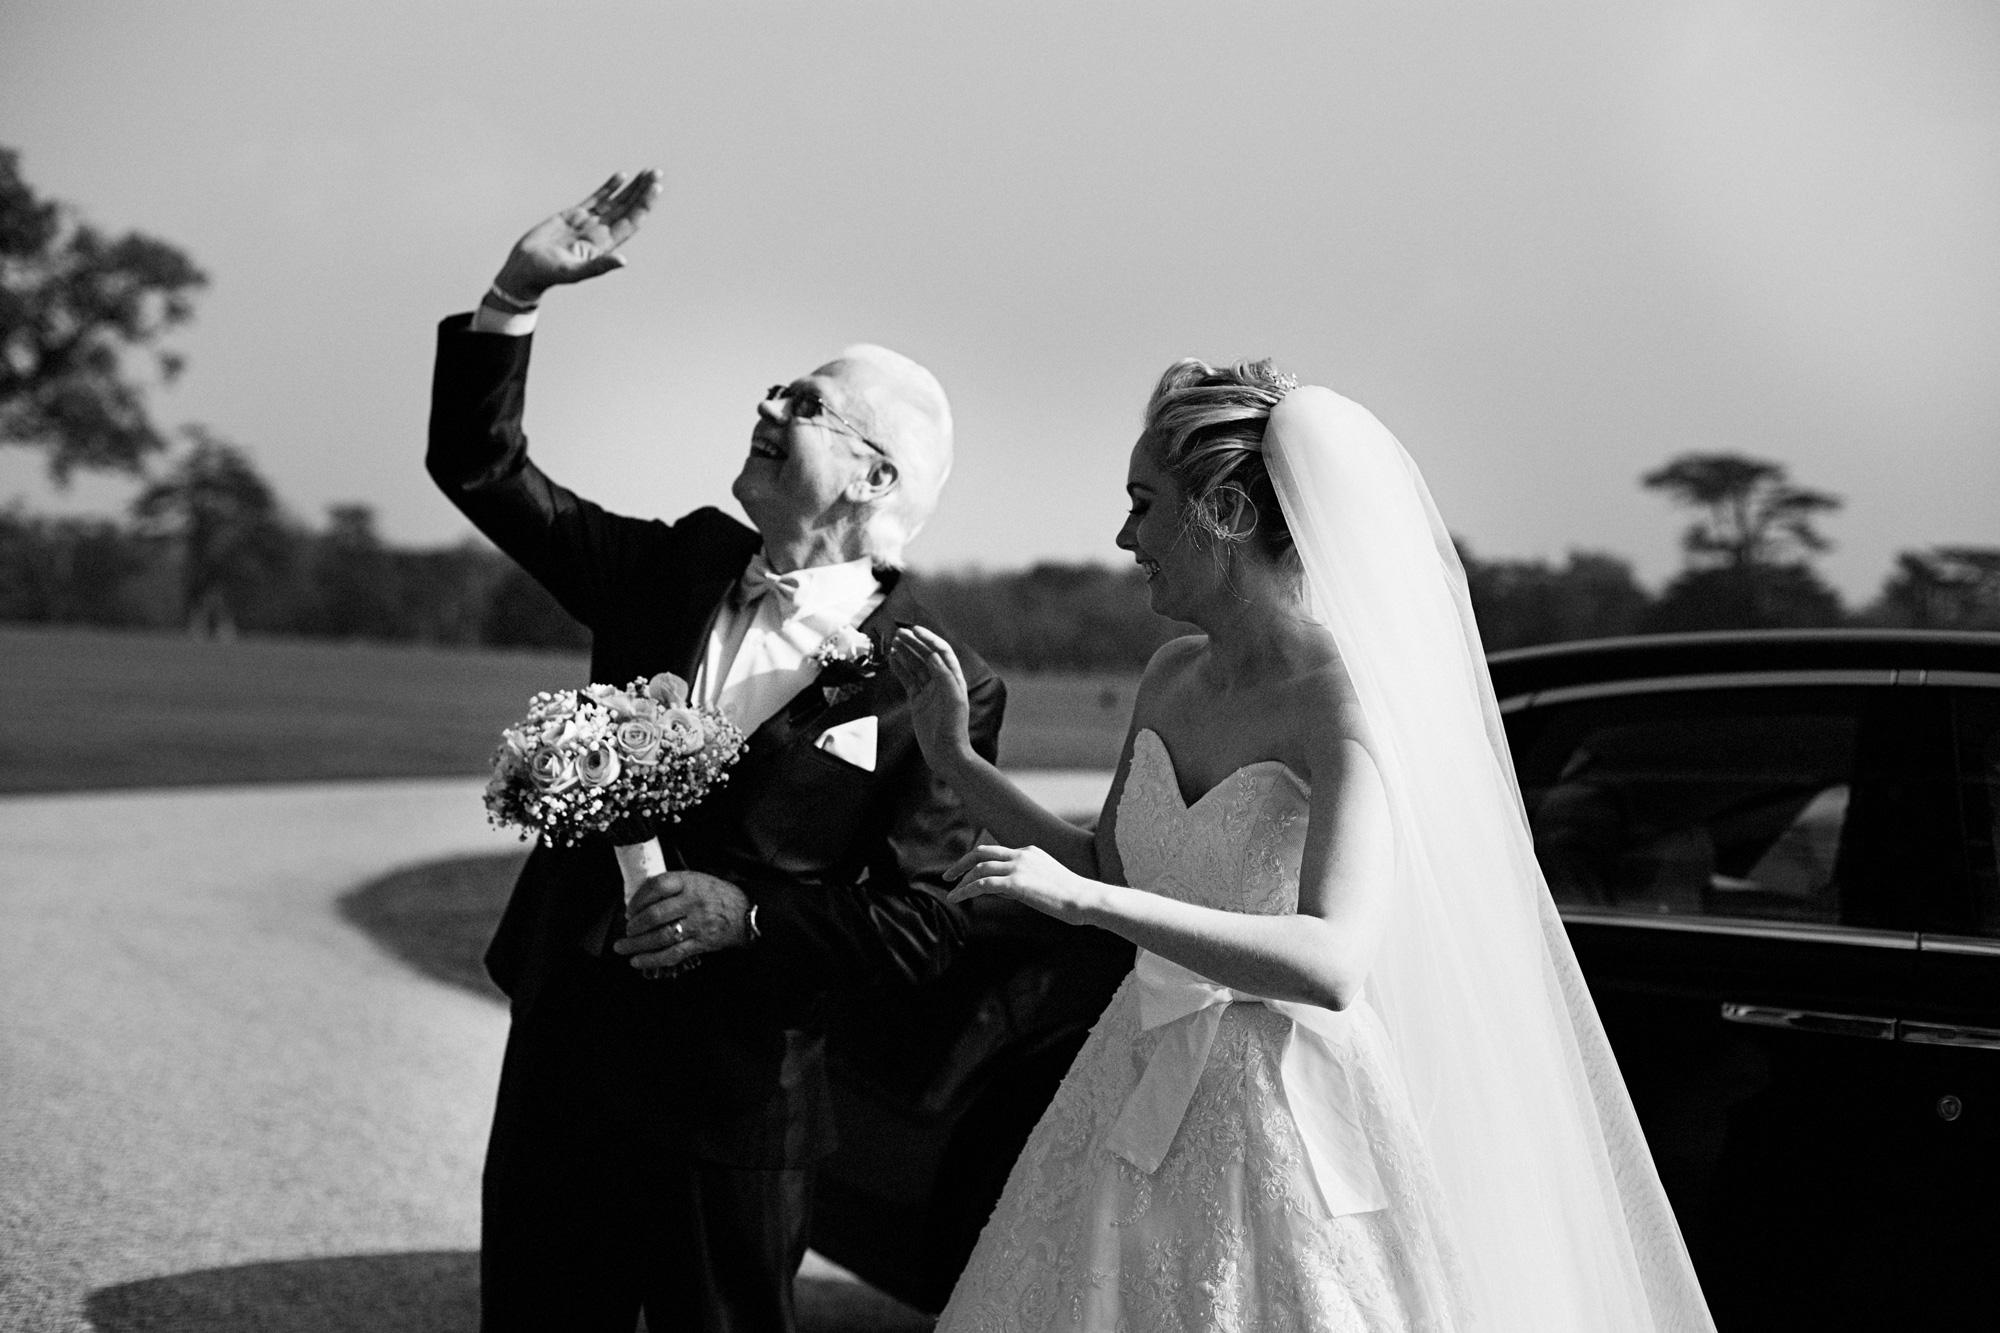 Father of bride wedding car